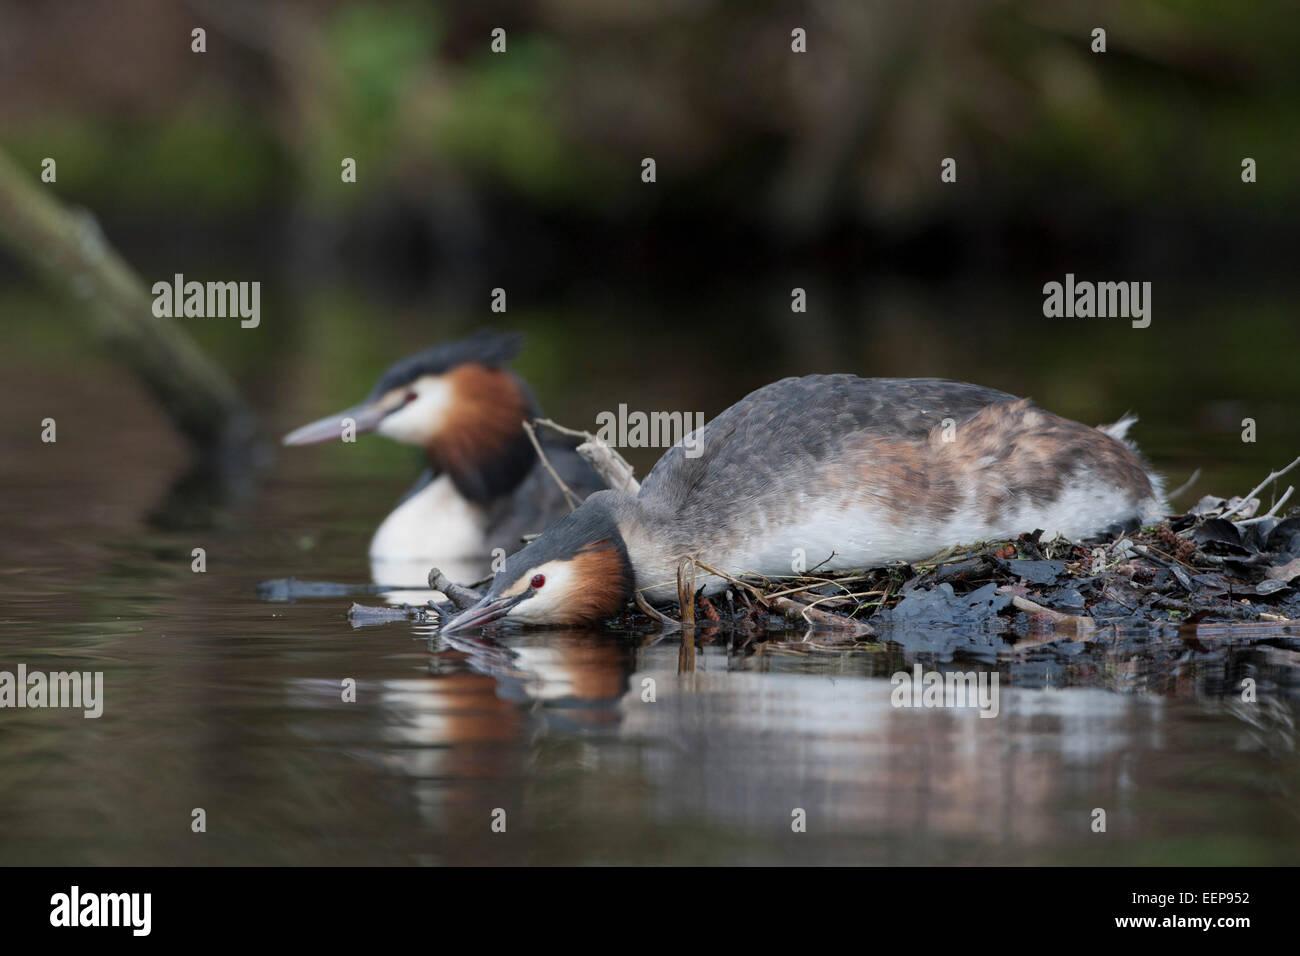 Haubentaucher  / Podiceps cristatus / great crested grebe [Podiceps cristatus] - Stock Image